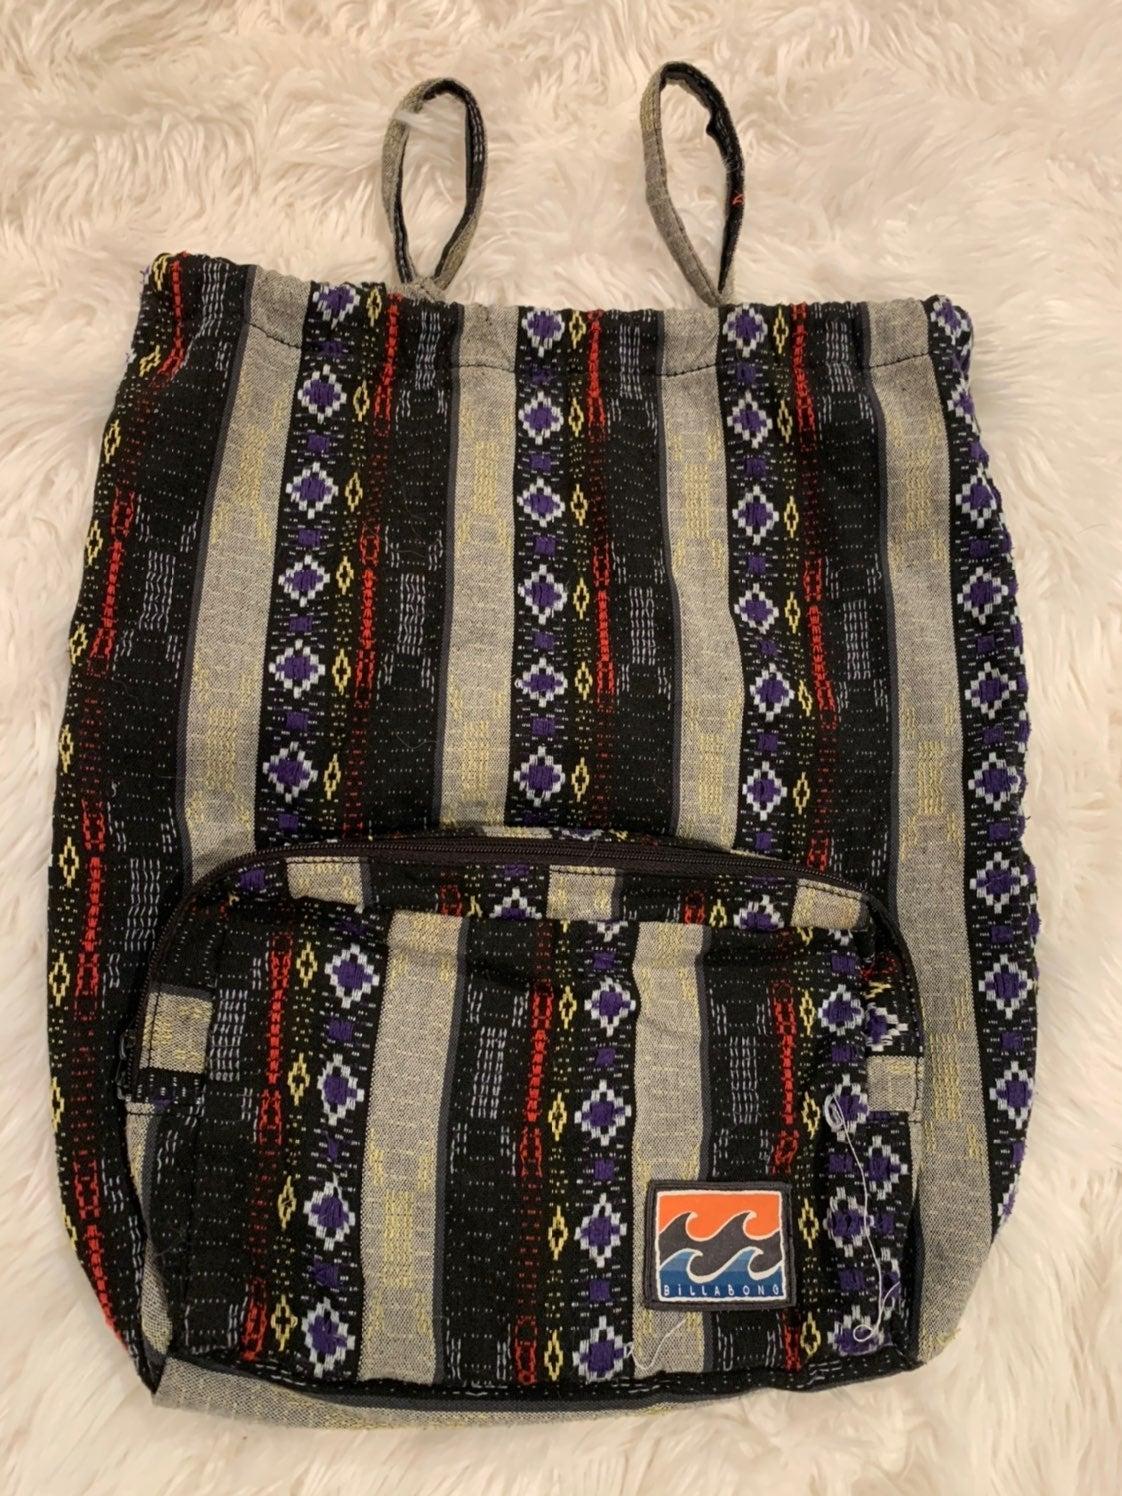 Billabong tribal stitch backpack used